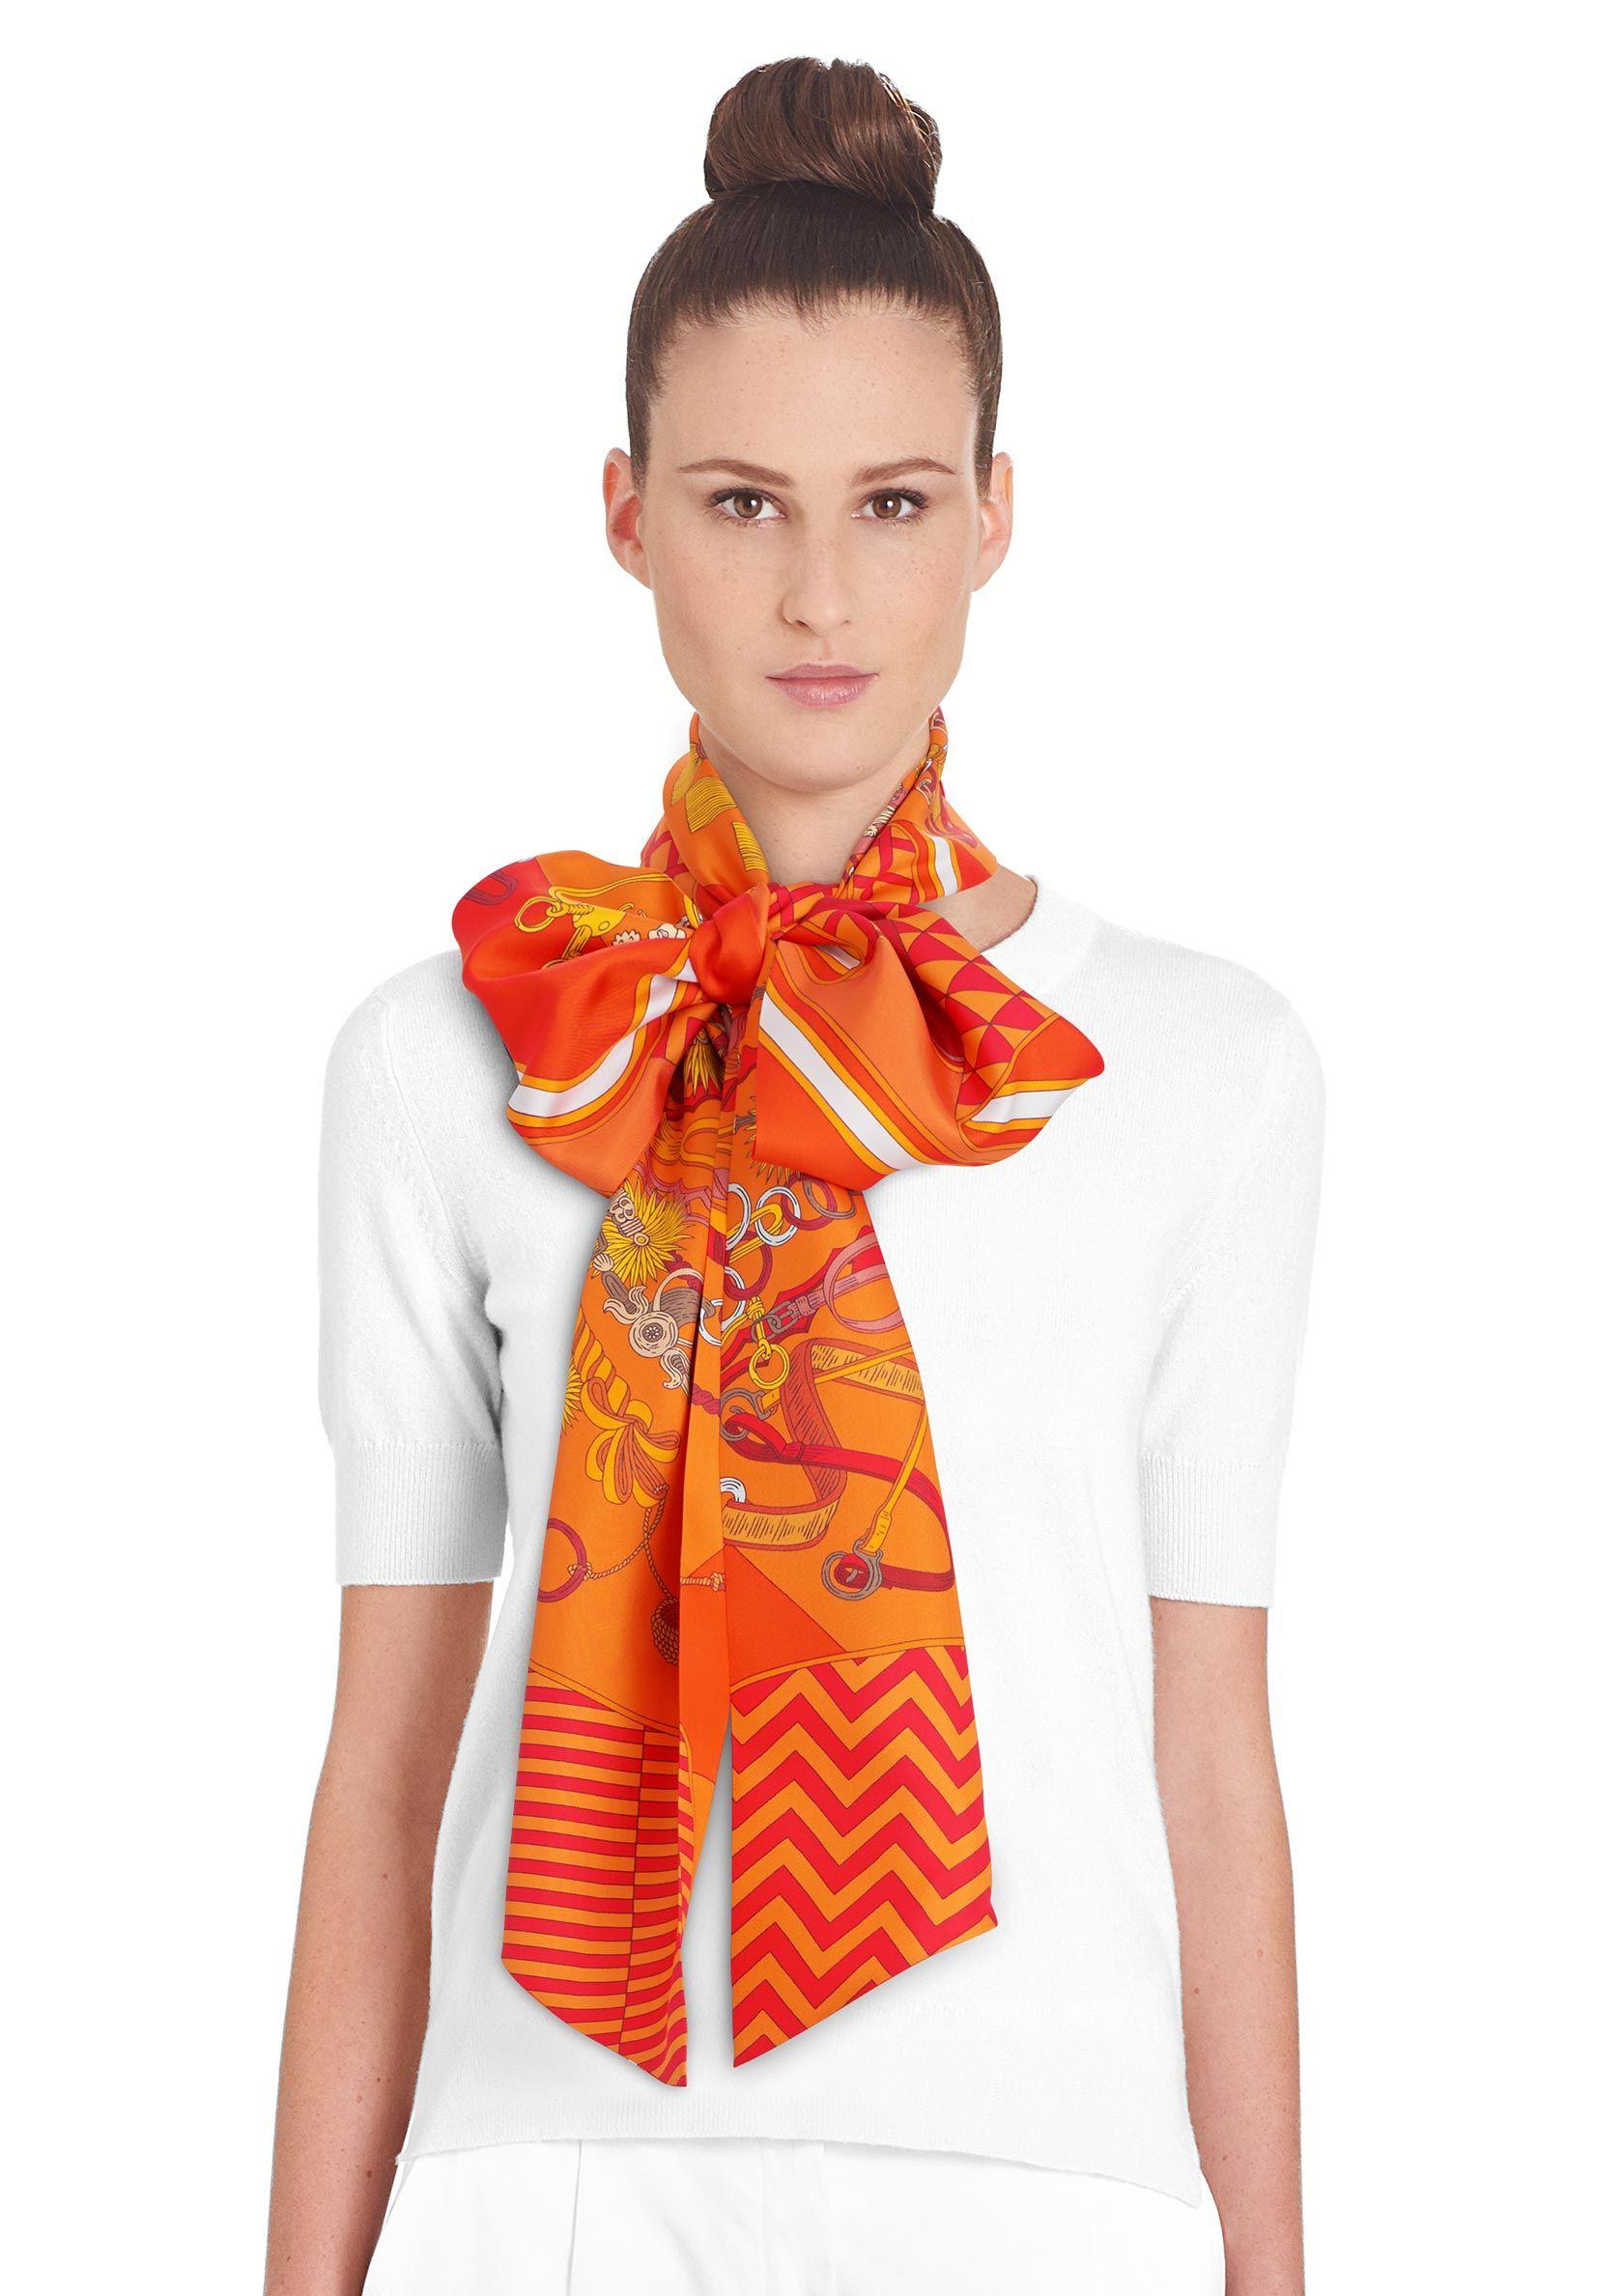 763d53b0e082 Maxi-twilly Hermès   Bouquets Sellier Nouer Foulard, Foulards, Achat, Foulards  Hermes